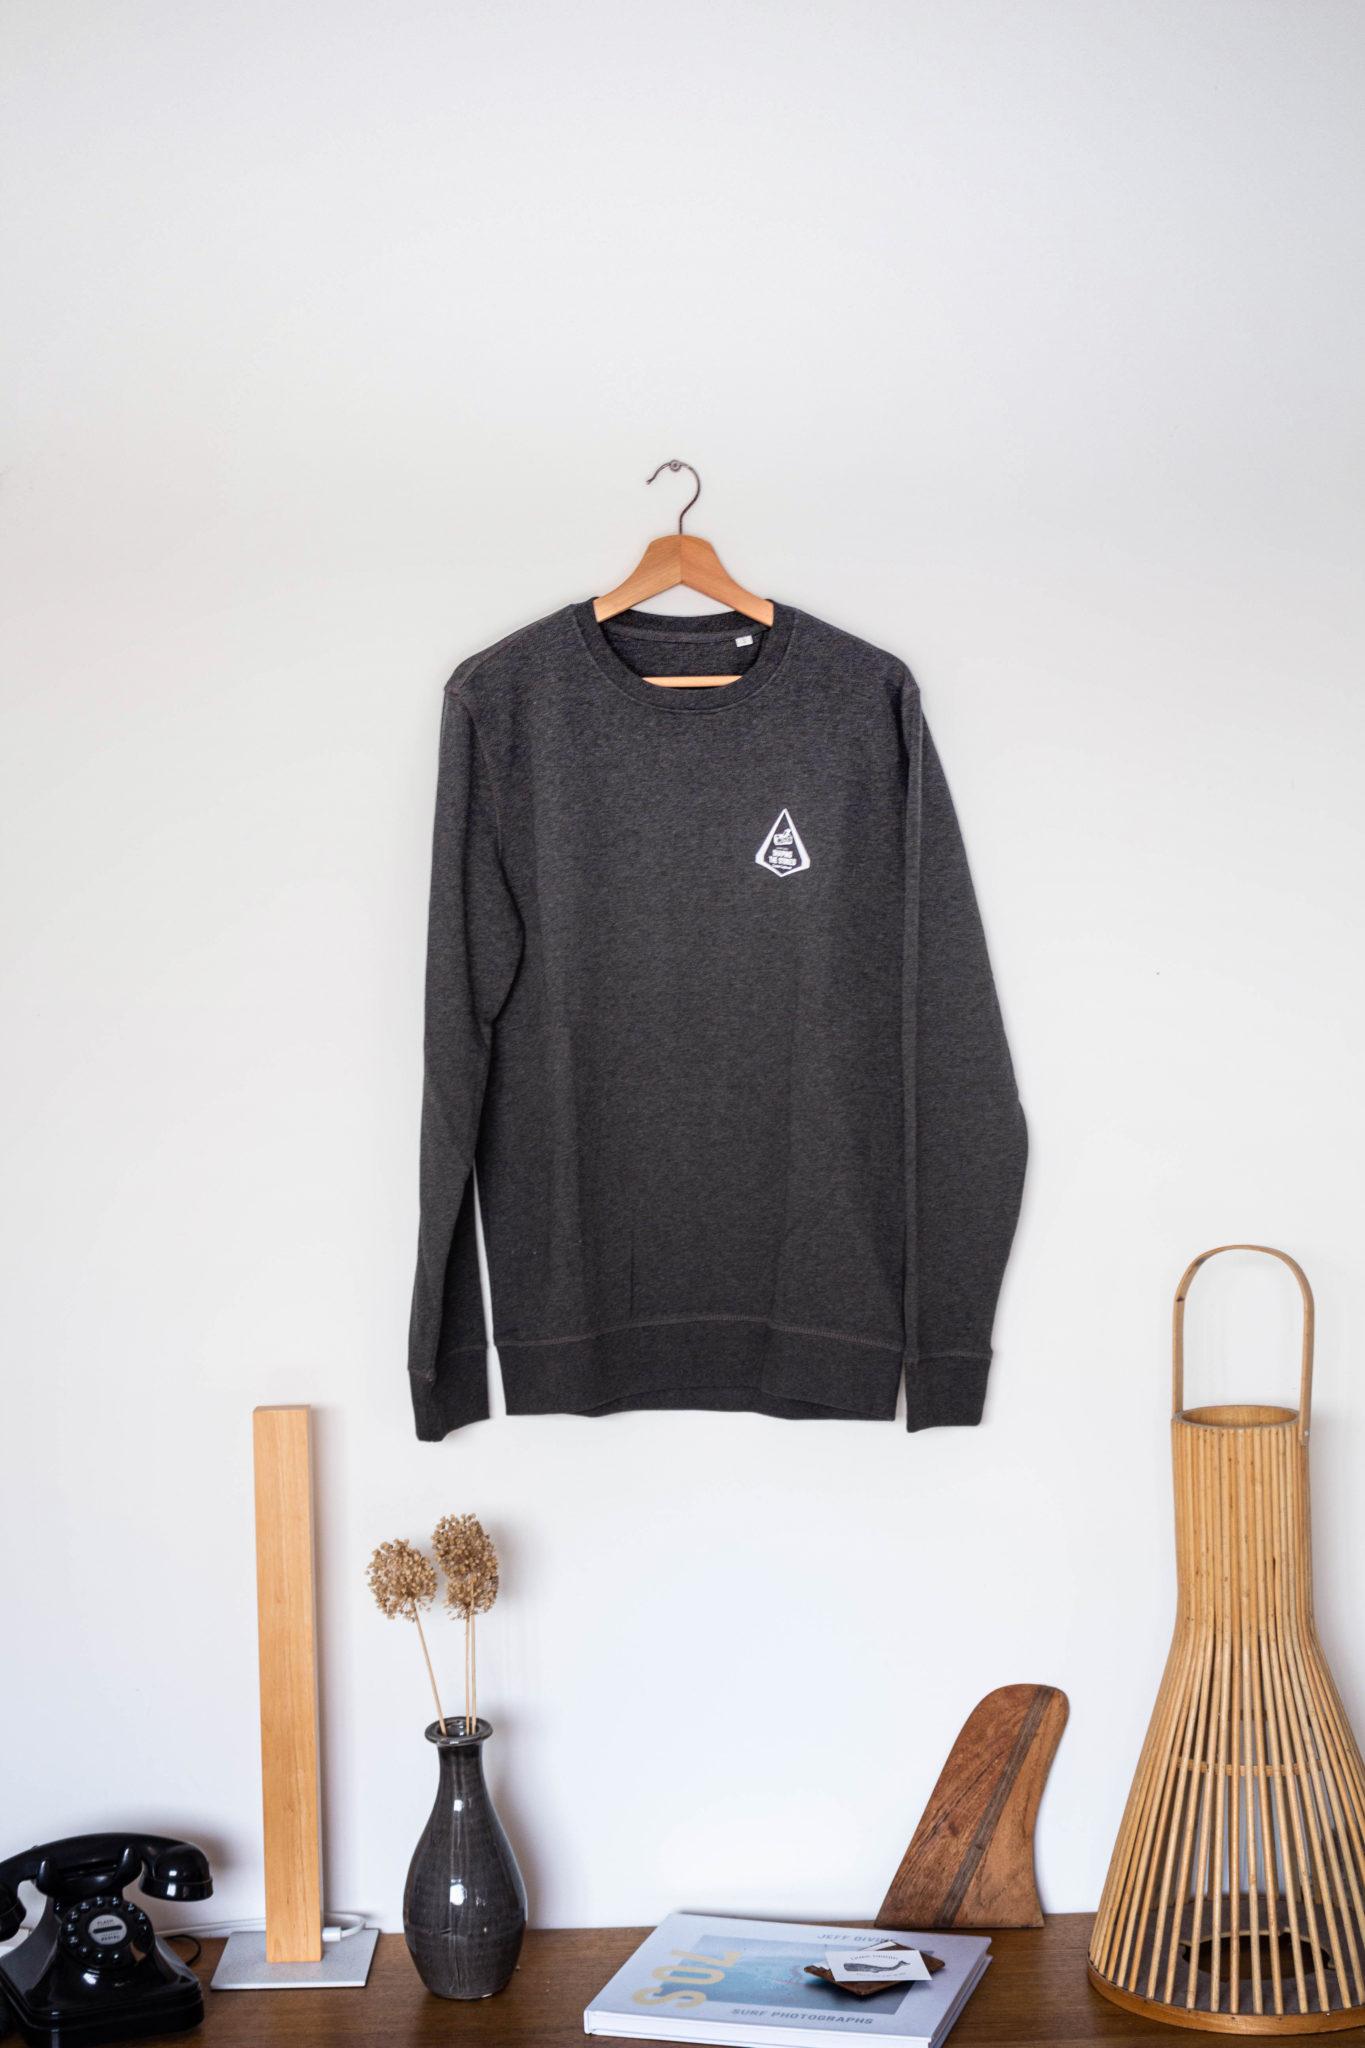 Cachalot Surfboards planche surf handmade artisan shaper textile sweat gris